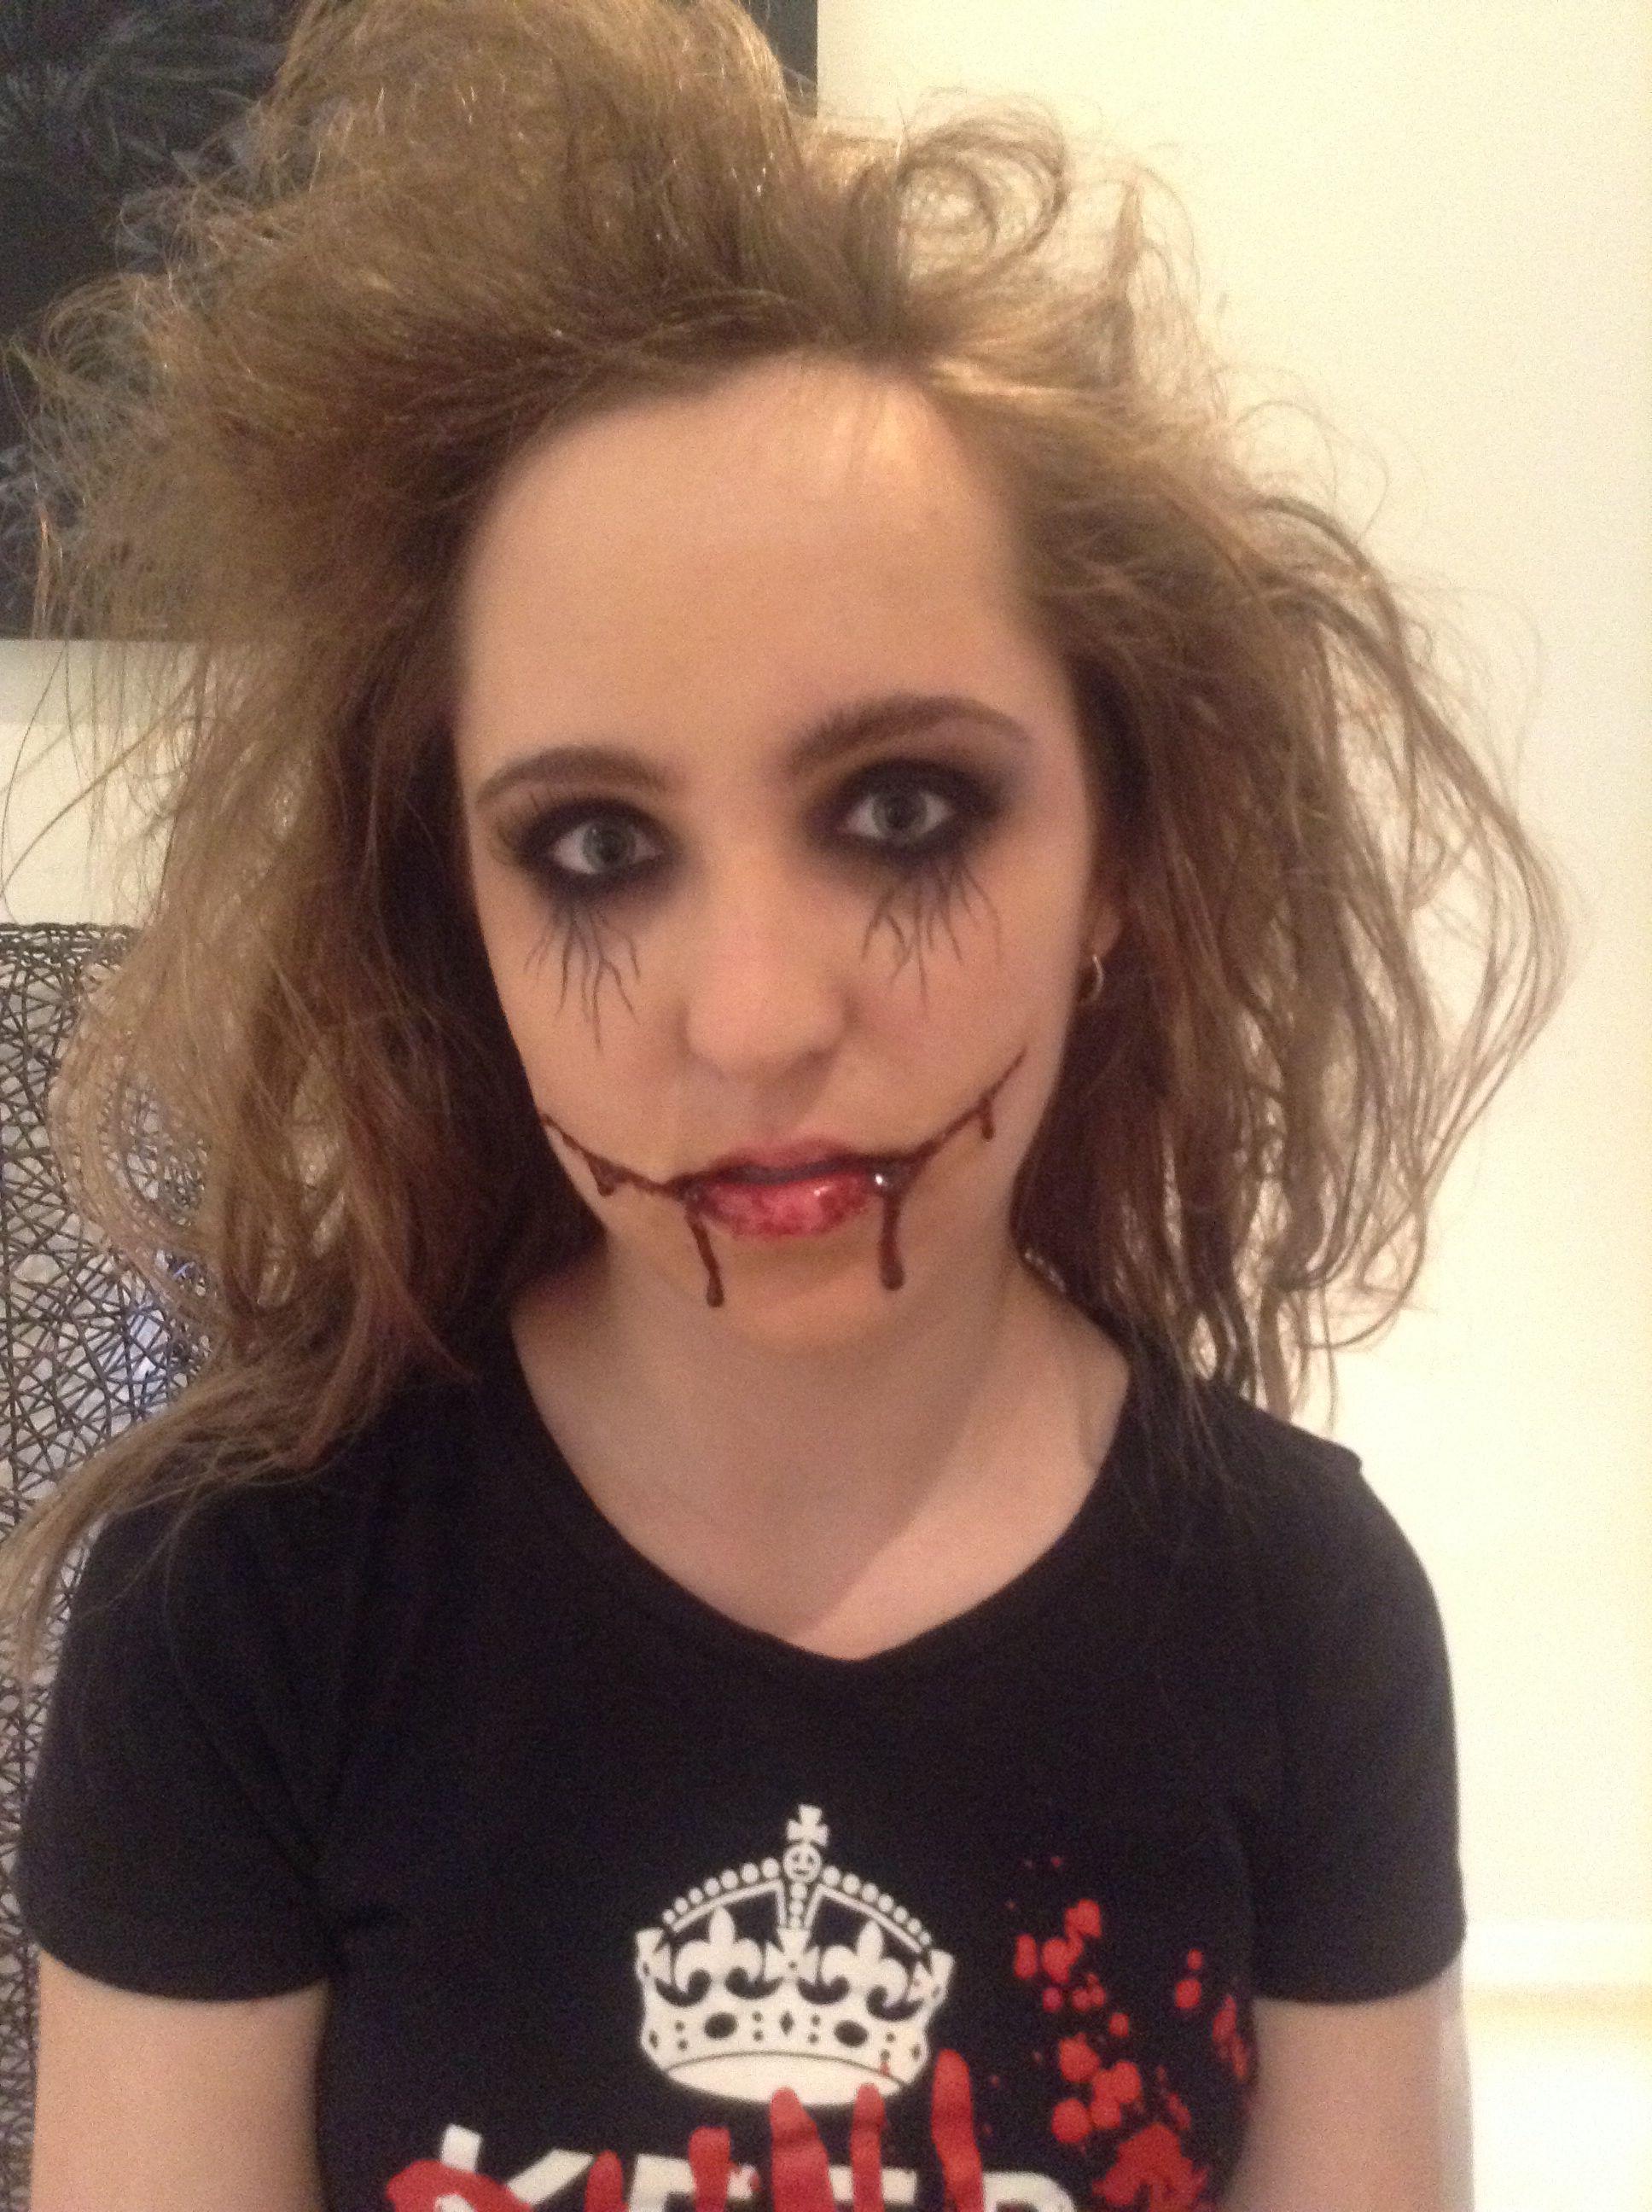 My Halloween costume. Go to sleep? Halloween face